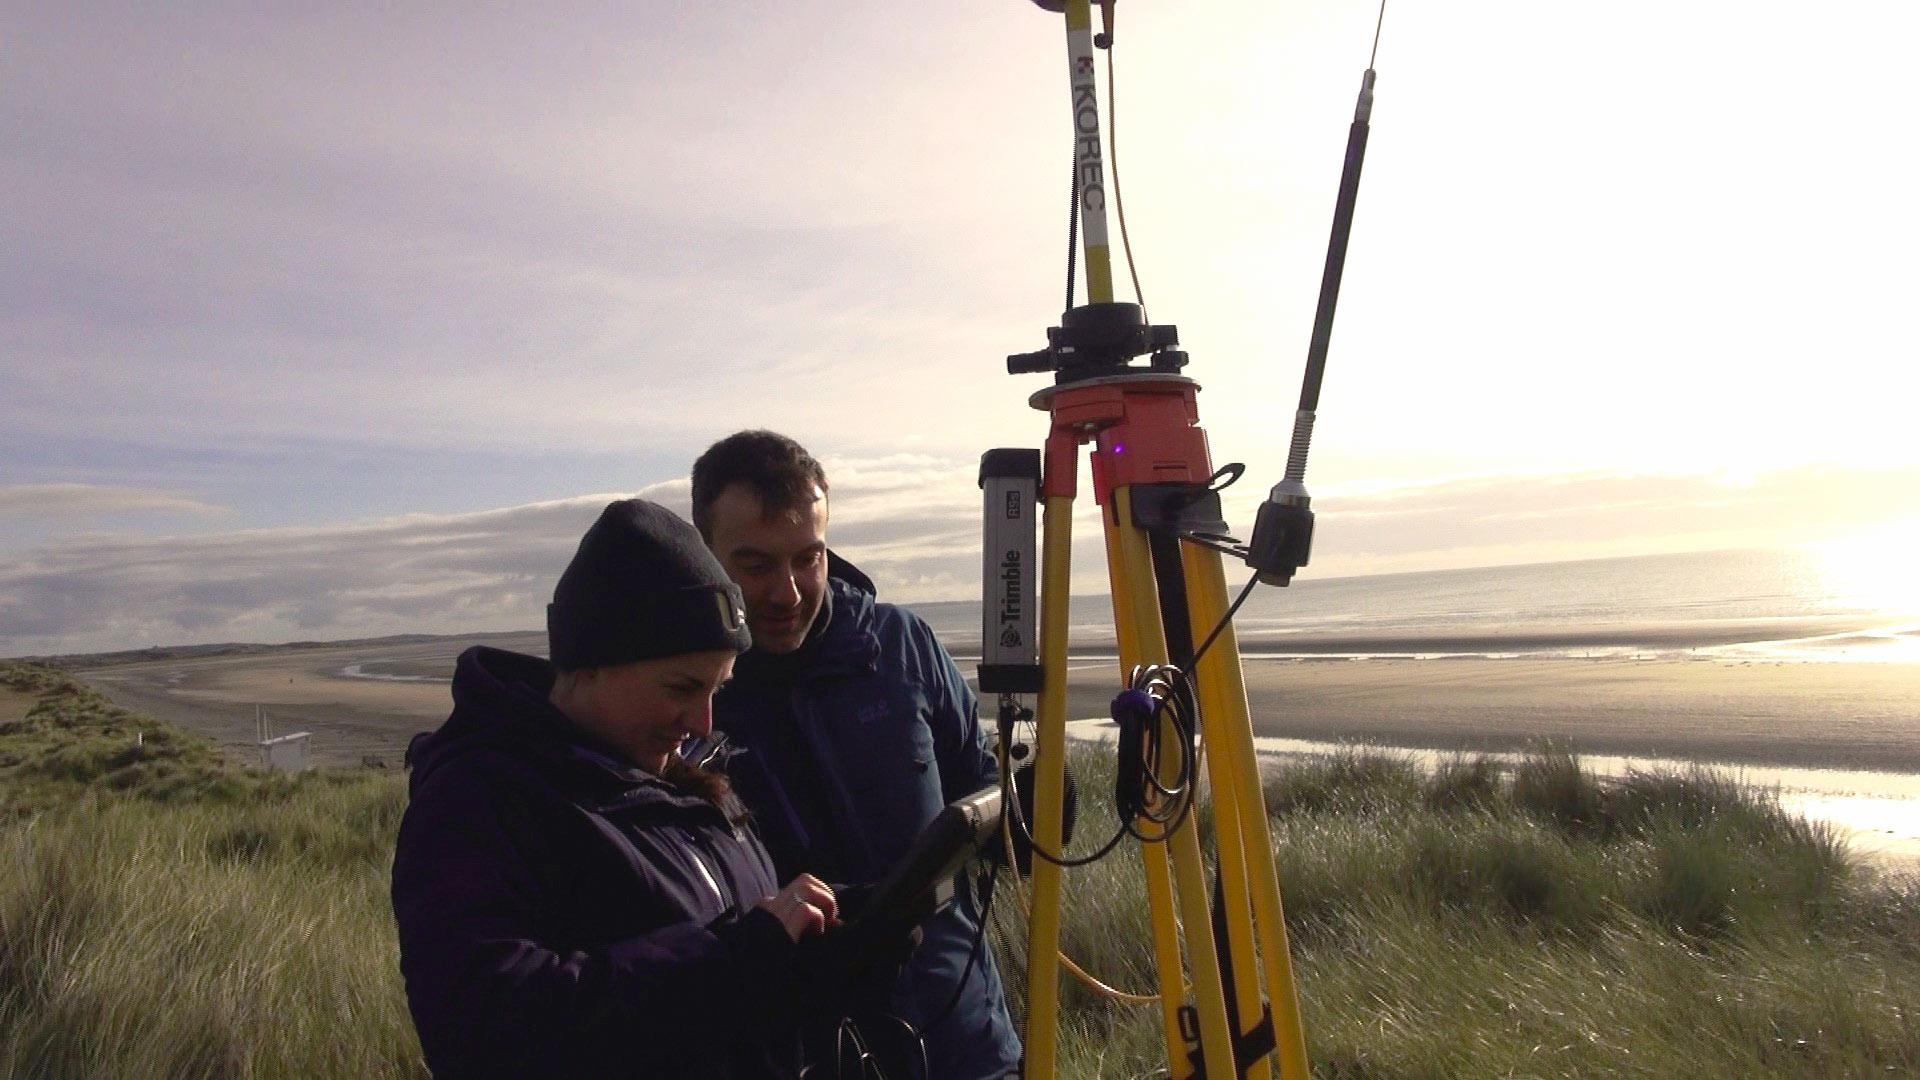 Drs Melanie Biausque and Edoardo Grottoli from Ulster University setting up a GPS base station.